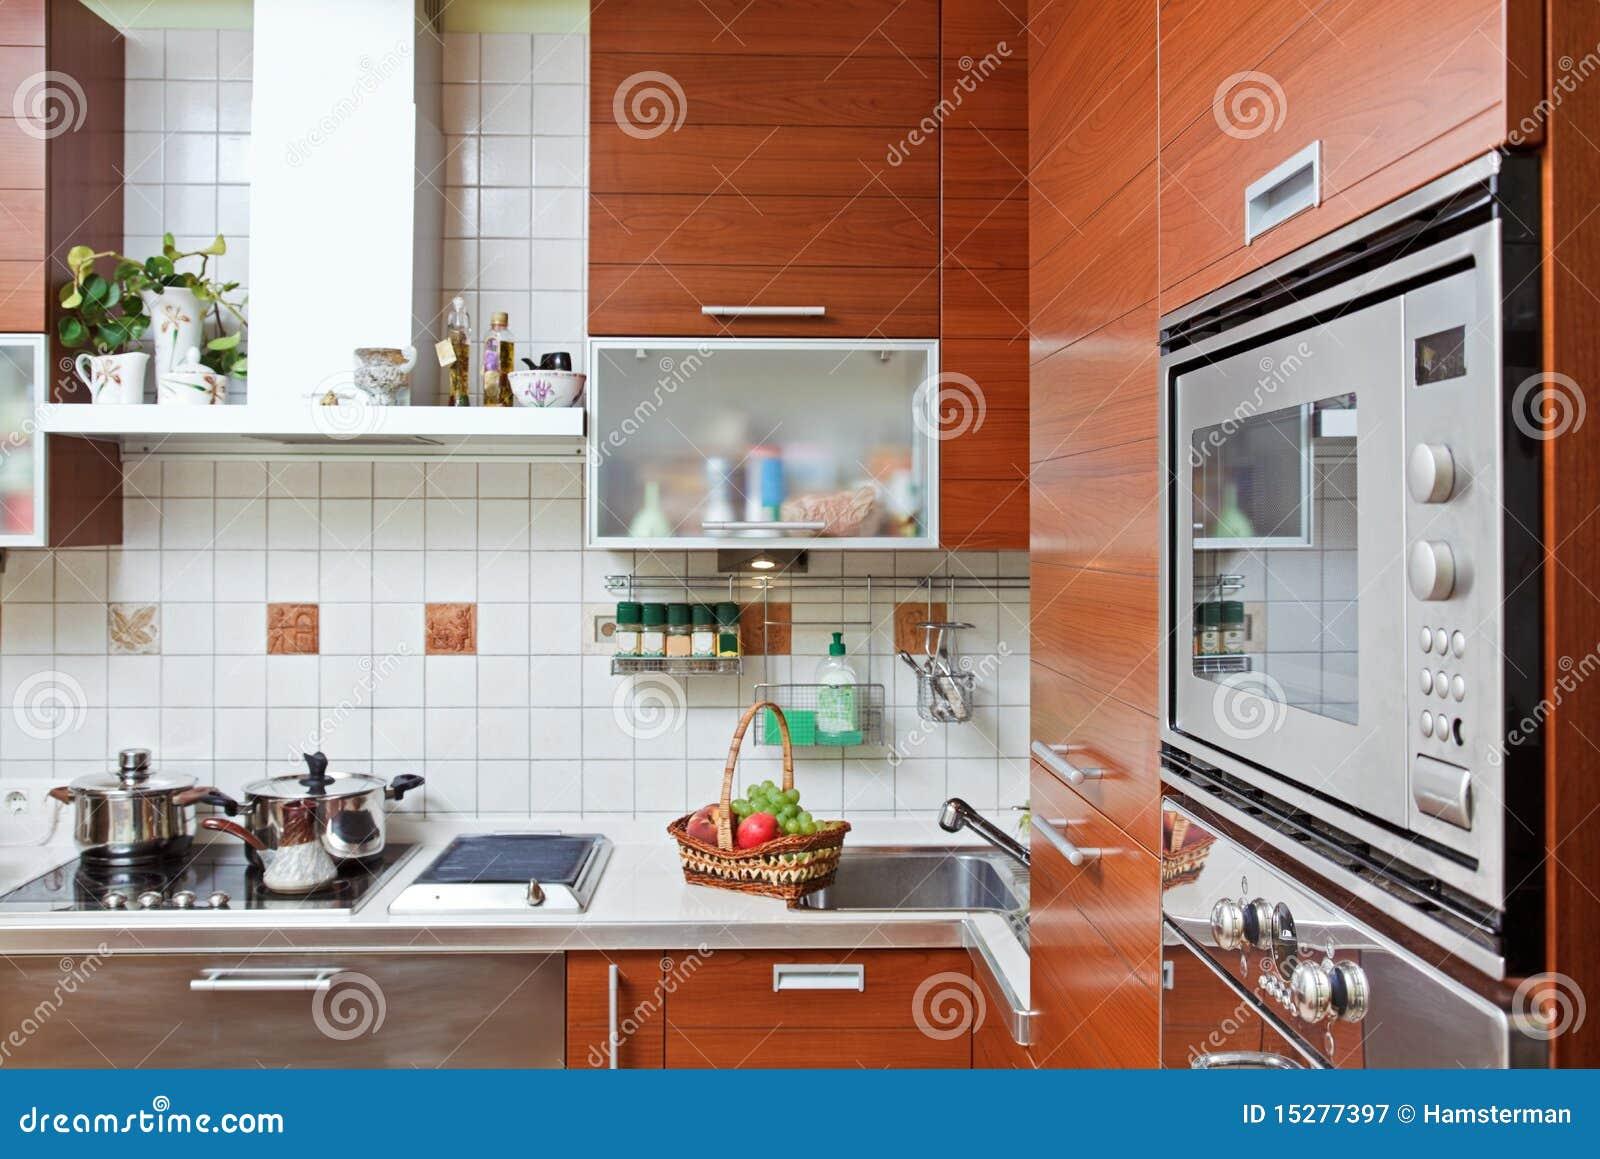 Estructura En El Horno Microondas En Cocina Moderna Stock de ...